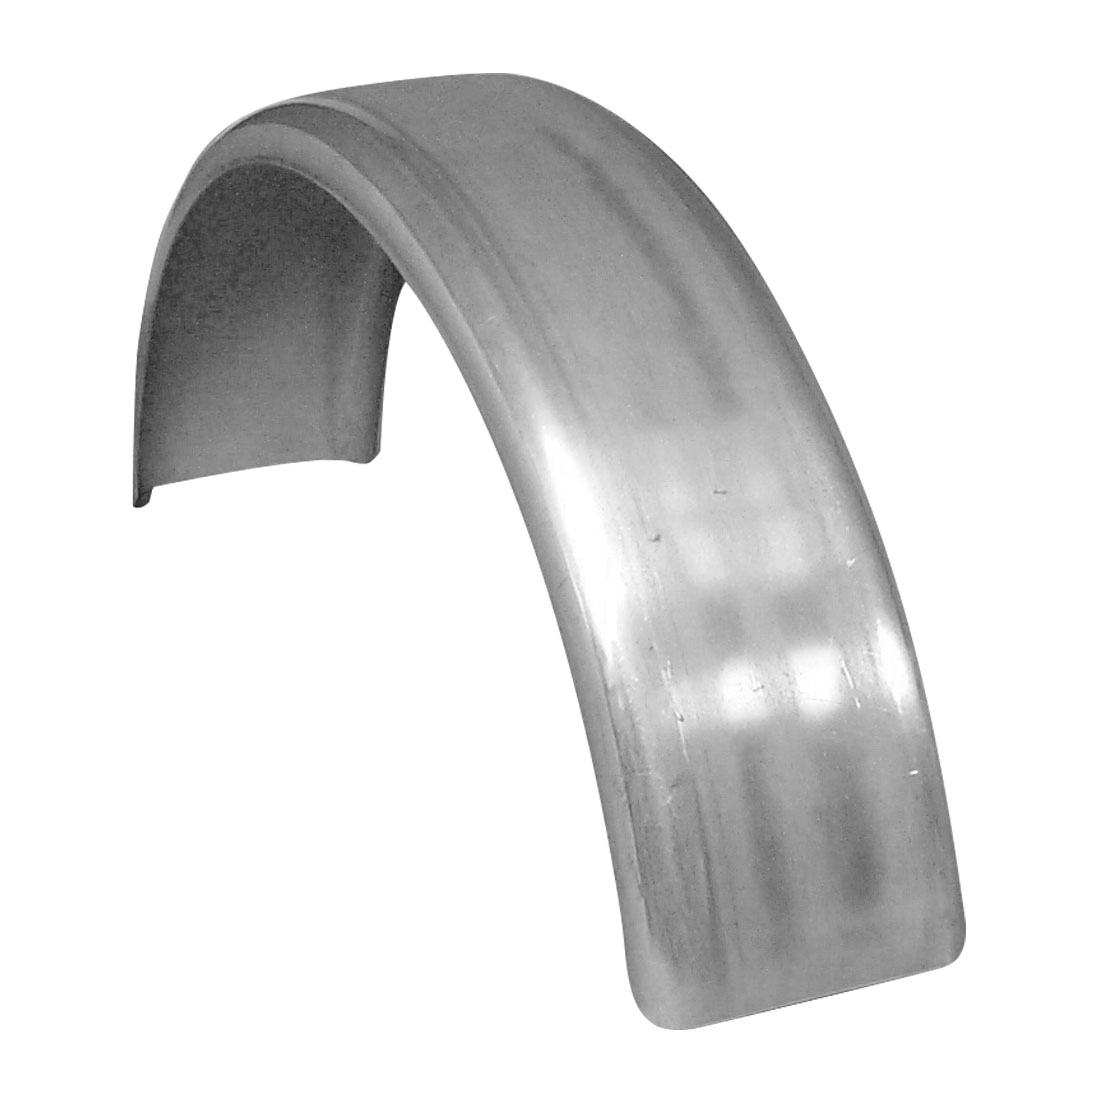 Paughco Universal Steel Fender